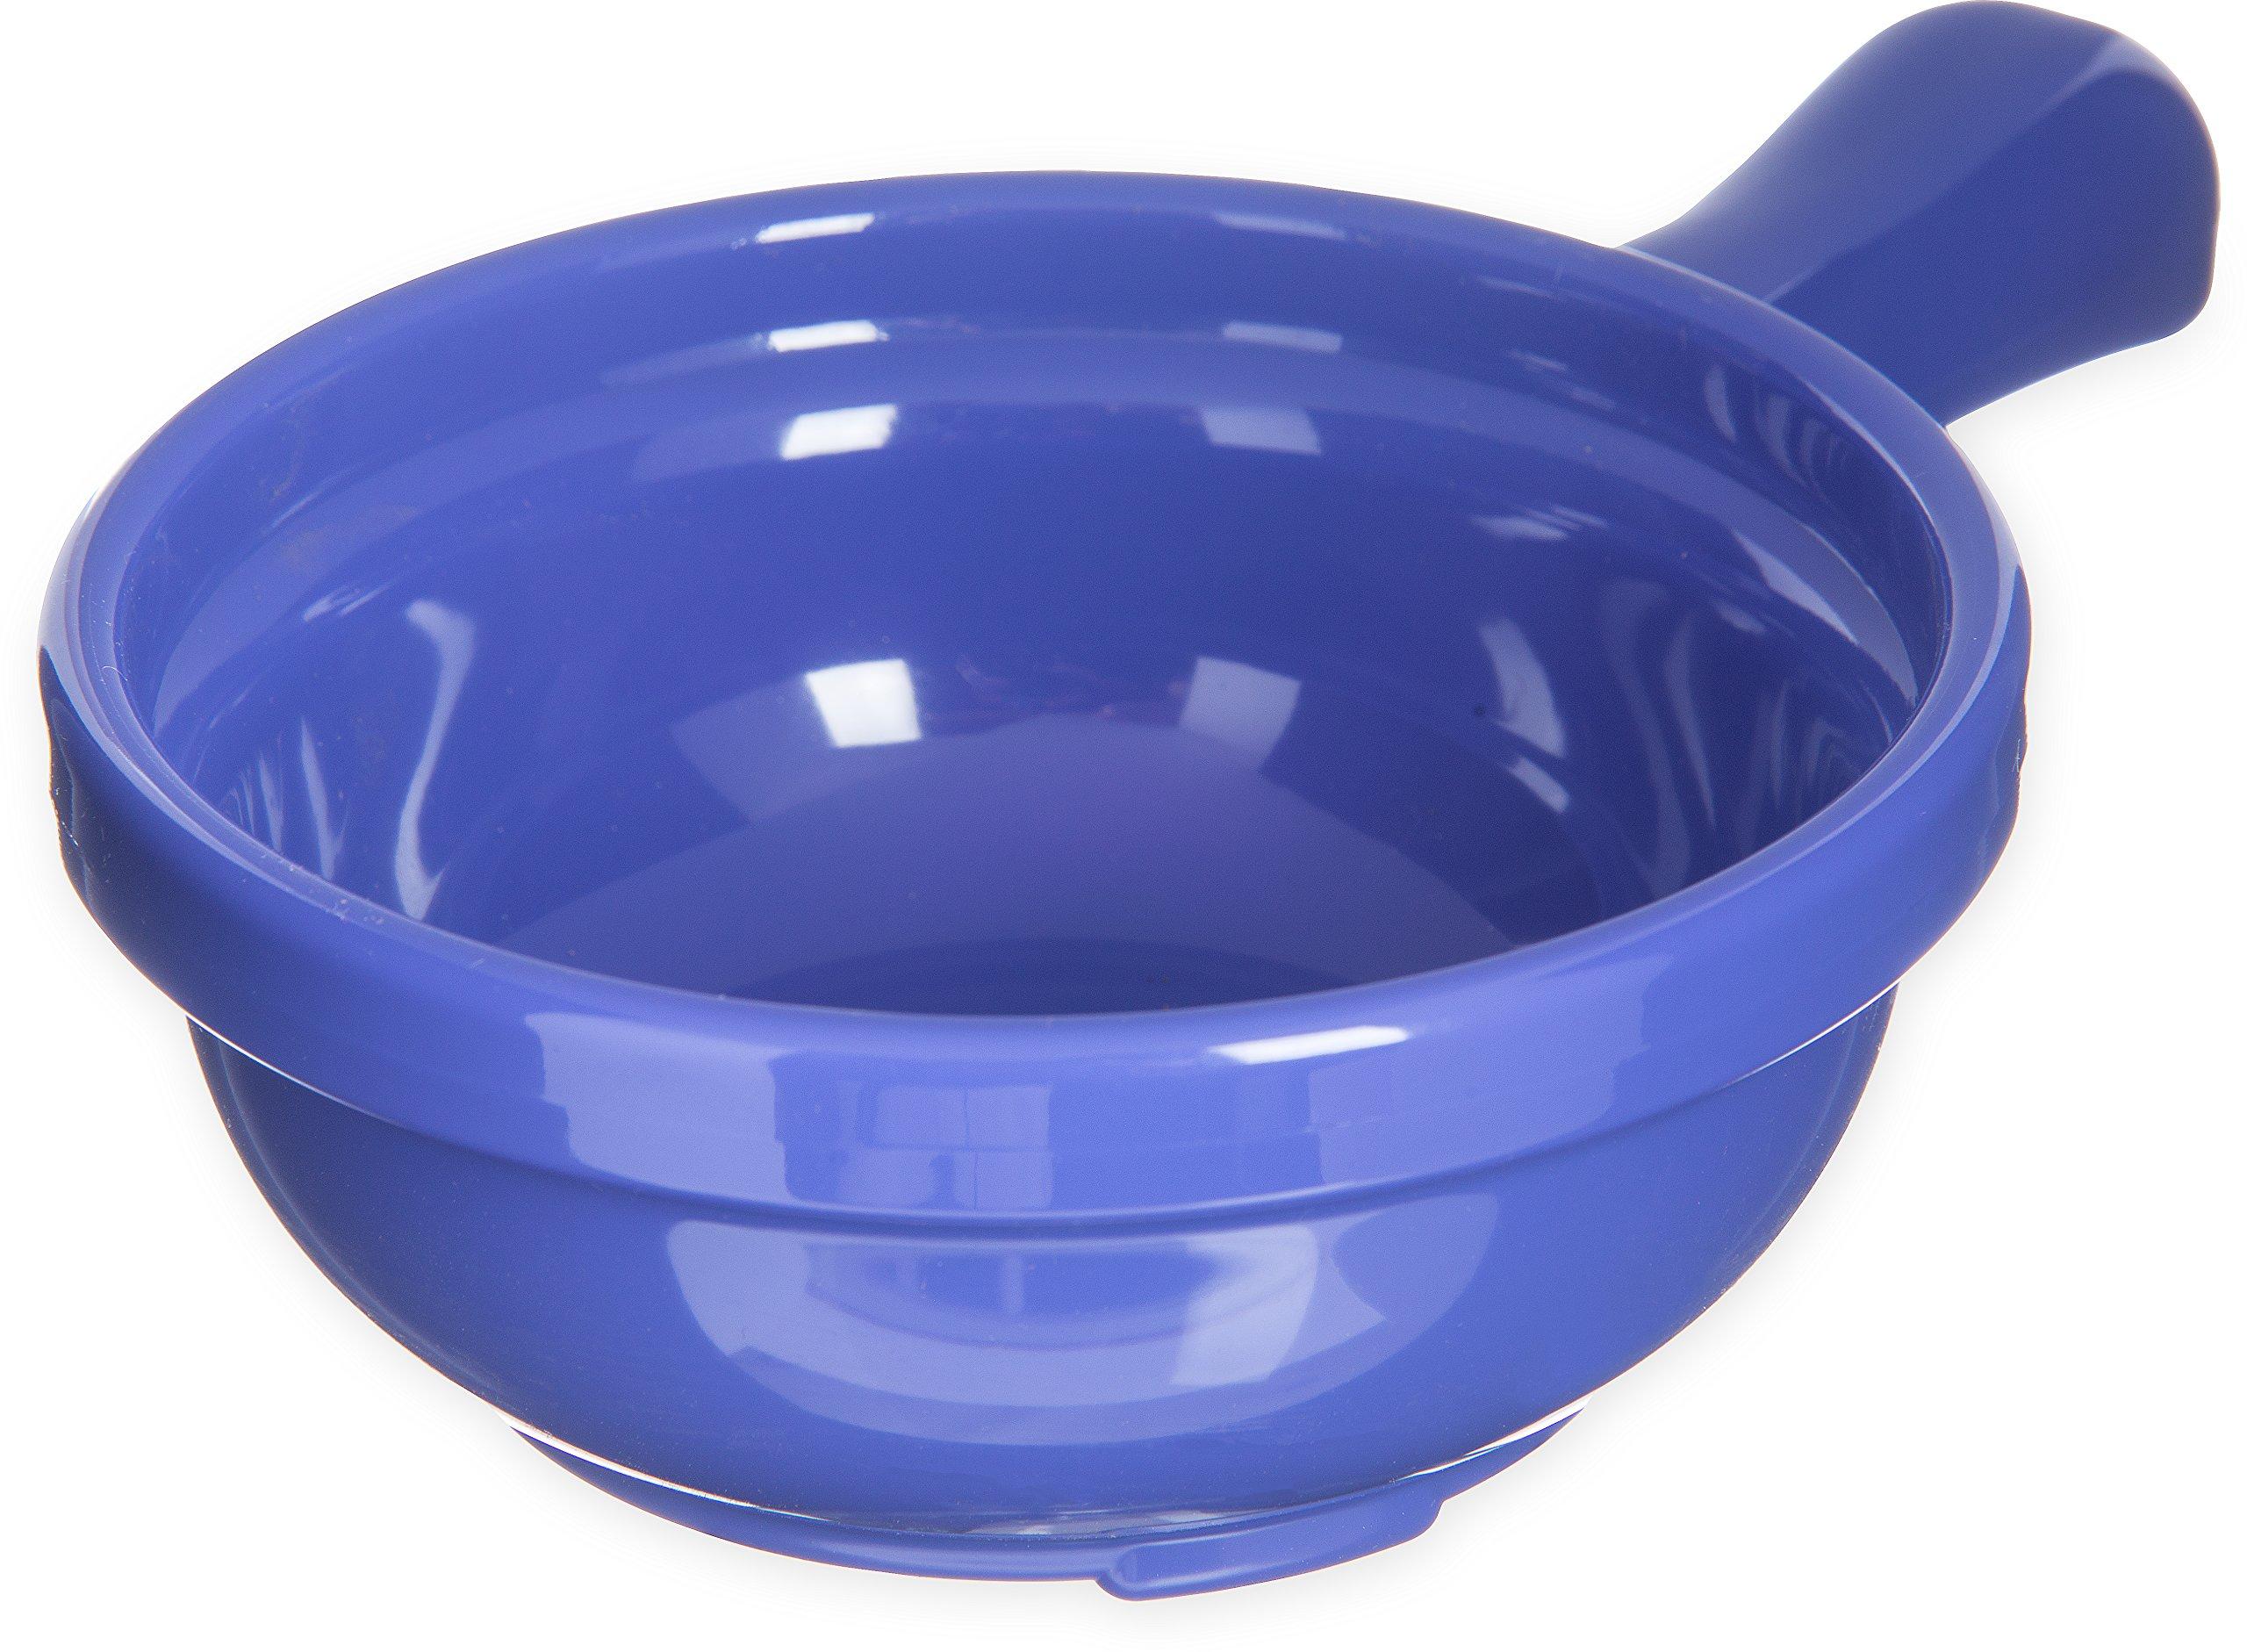 Carlisle 700614 Plastic Handled Soup Bowl, 8 oz., Ocean Blue (Pack of 24)